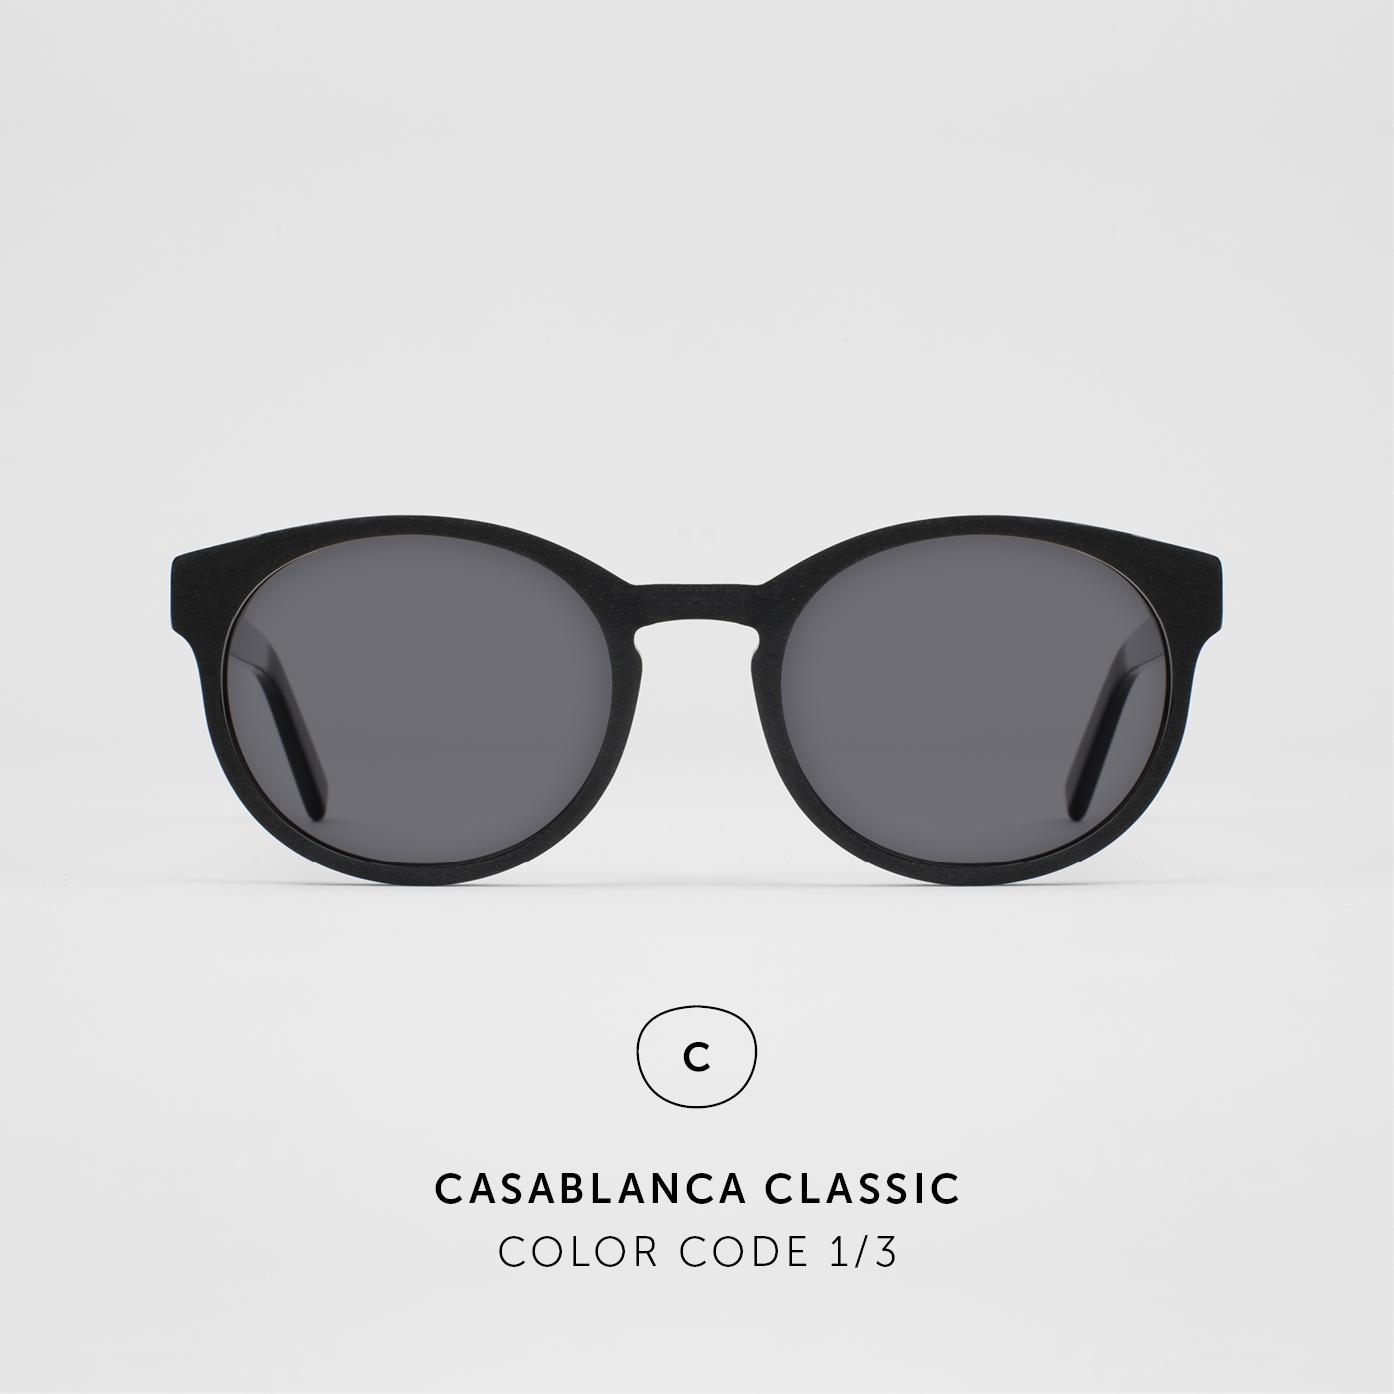 CasablancaClassic10.jpg